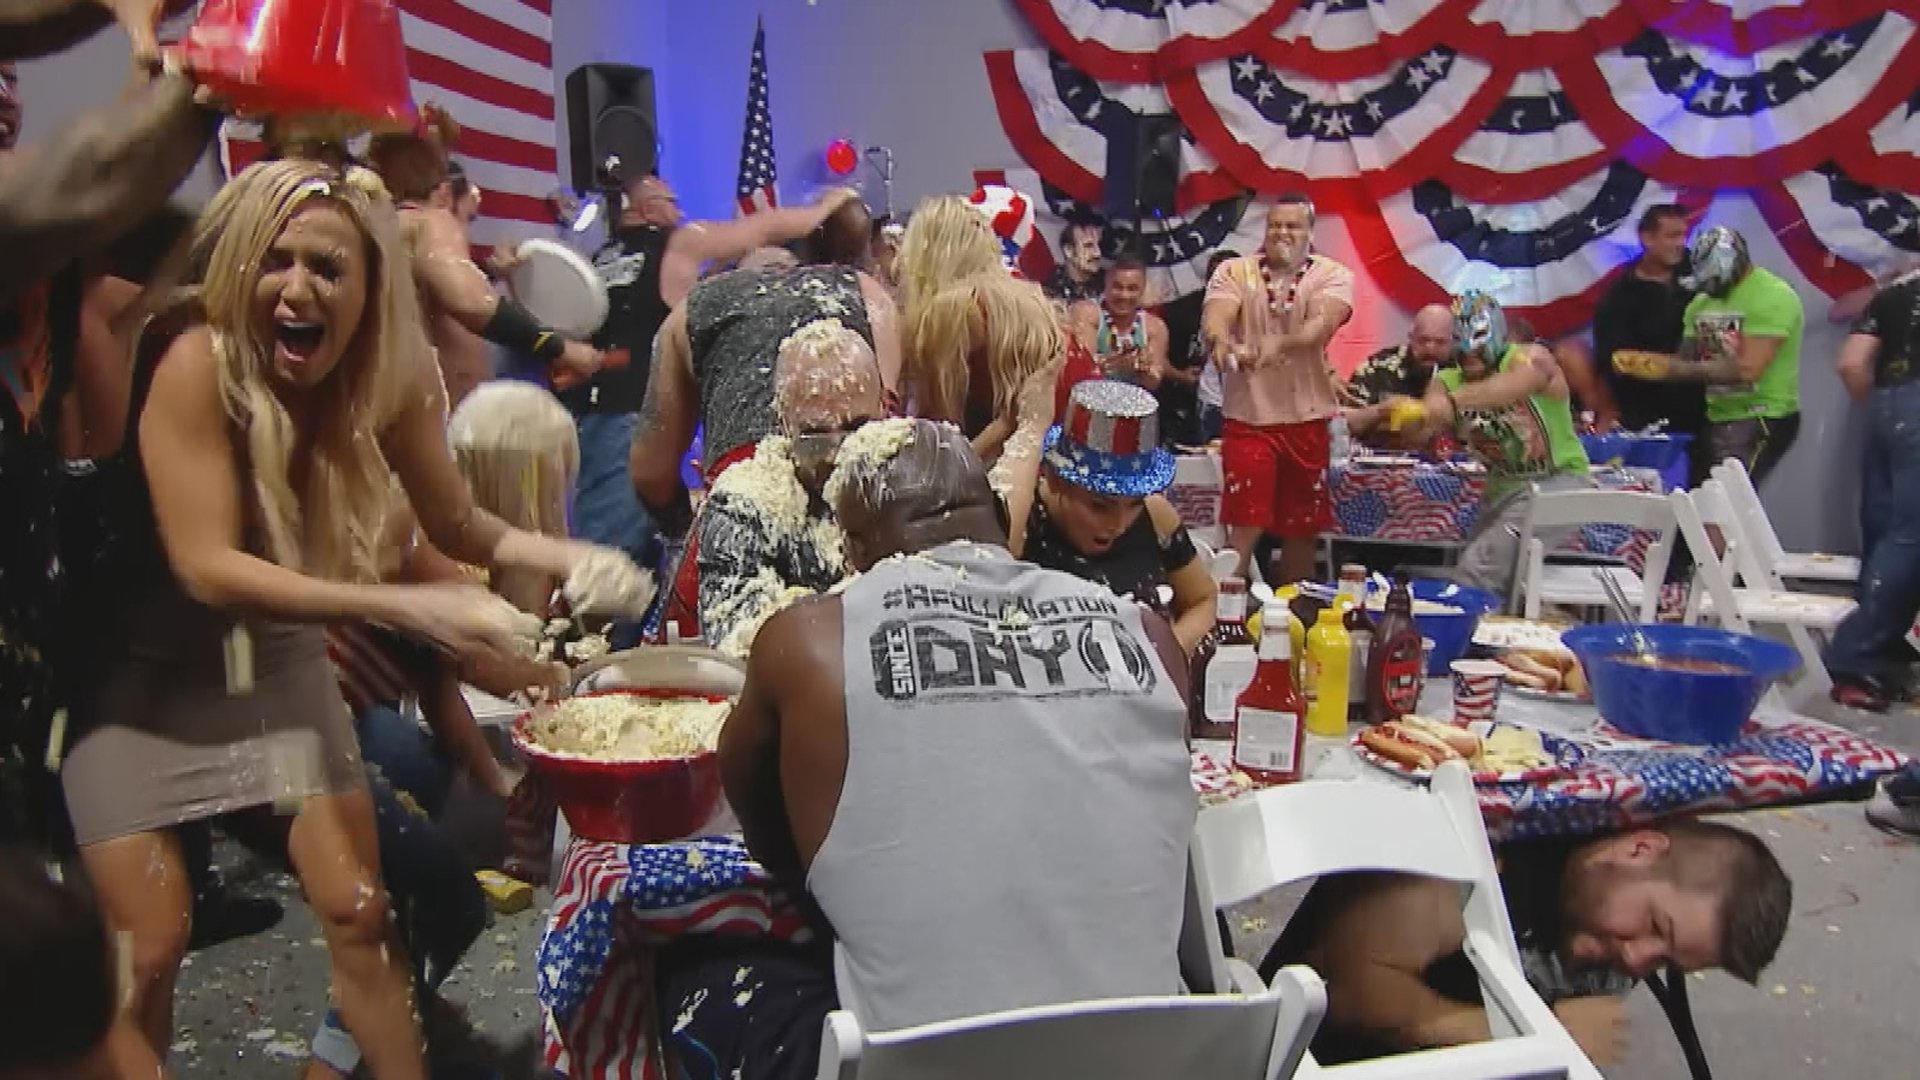 Resultats WWE RAW 4 juillet